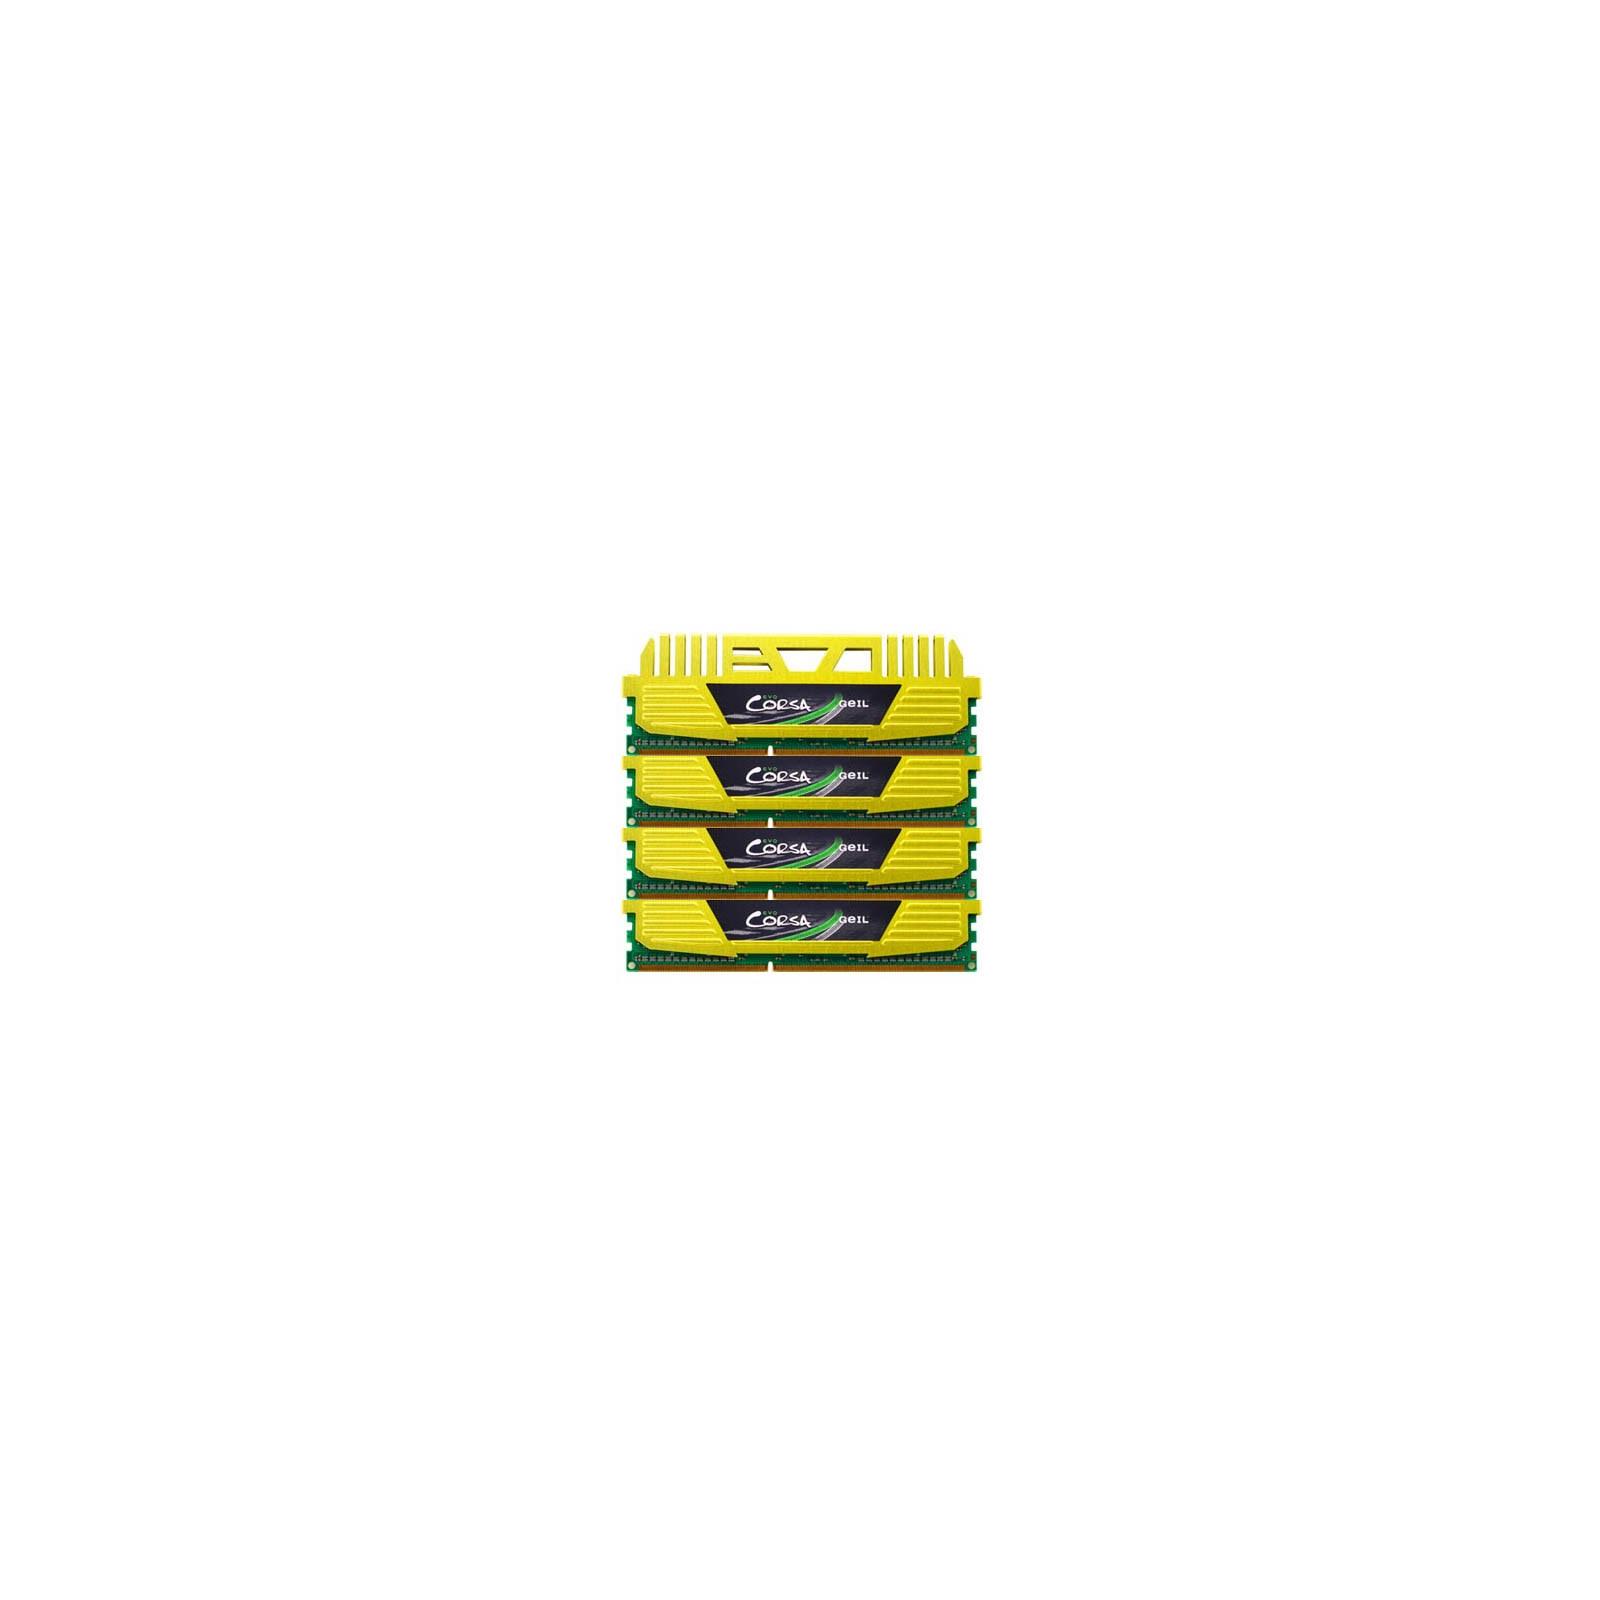 Модуль памяти для компьютера DDR3 16GB (4x4GB) 2133 MHz GEIL (GOC316GB2133C10AQC)